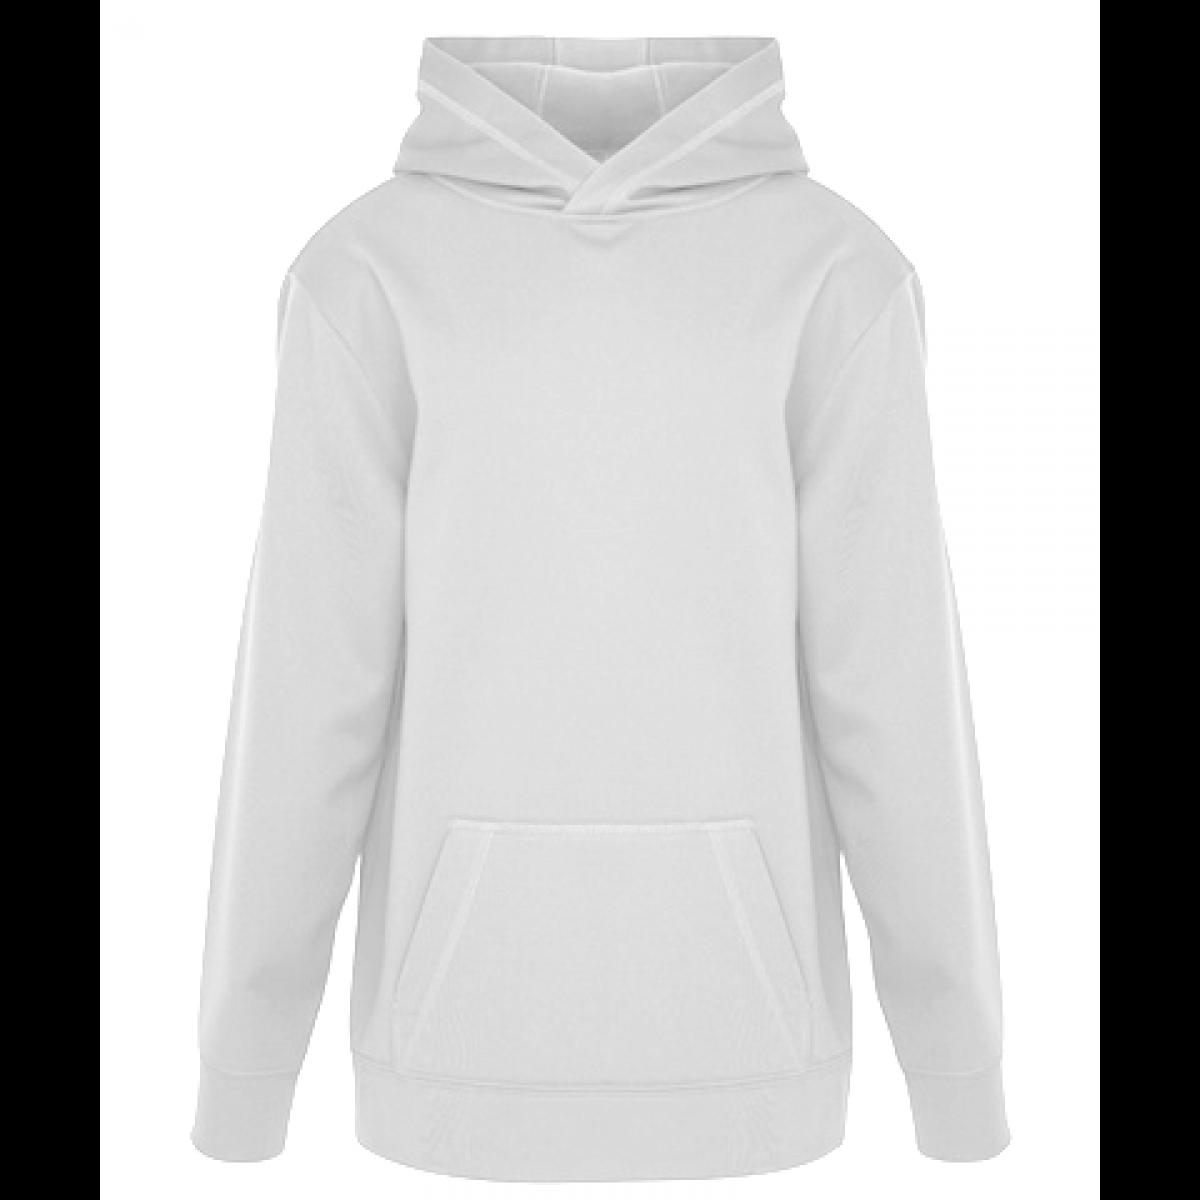 Game Day Fleece Hooded Ladies Sweatshirt-White-XL